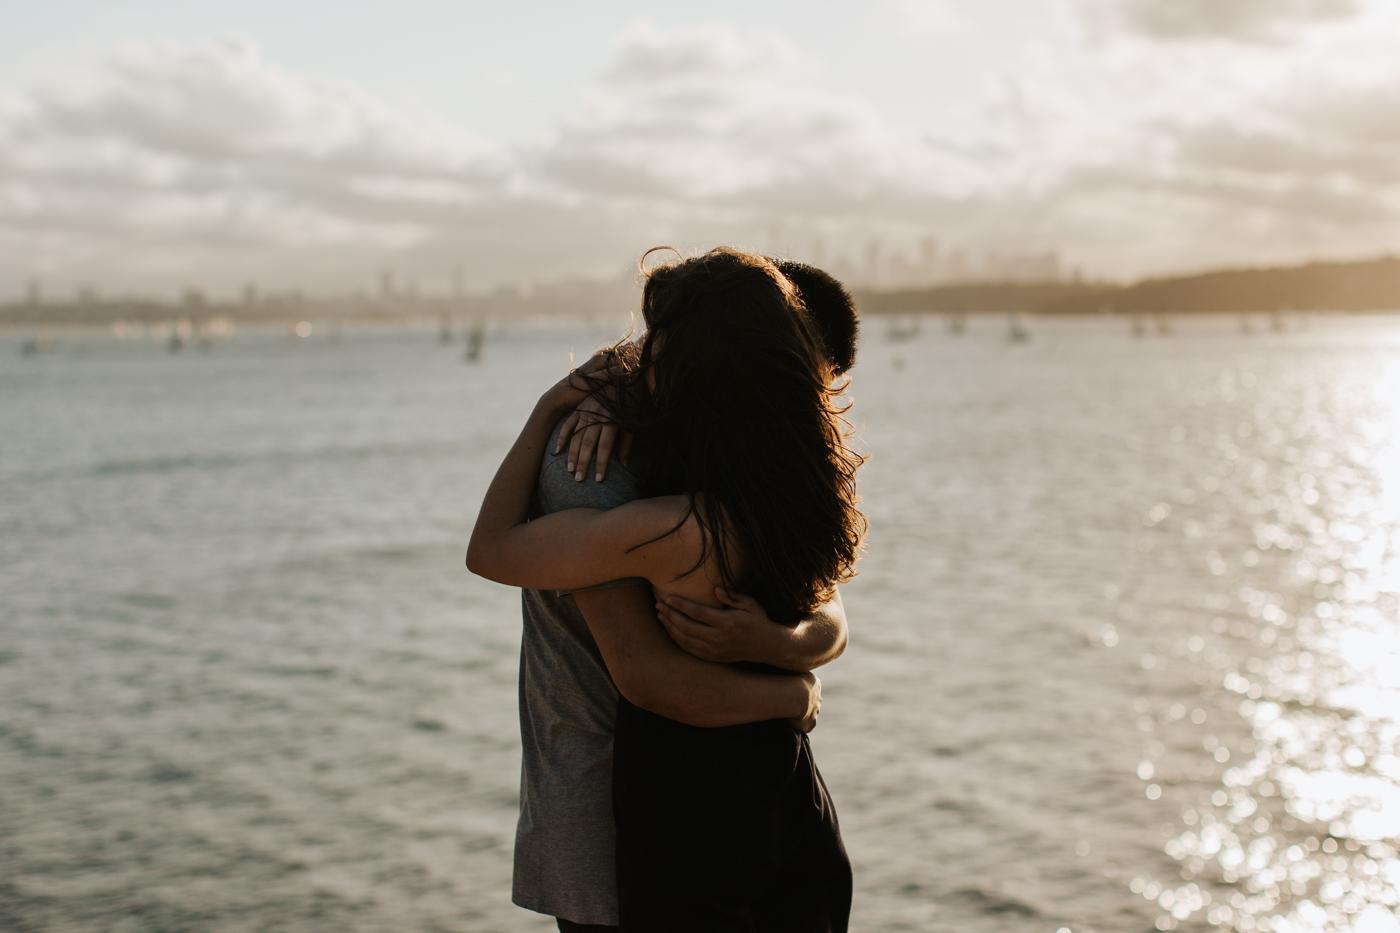 James & Caitie Engagement - Watsons Bay - Samantha Heather Photography-31.jpg